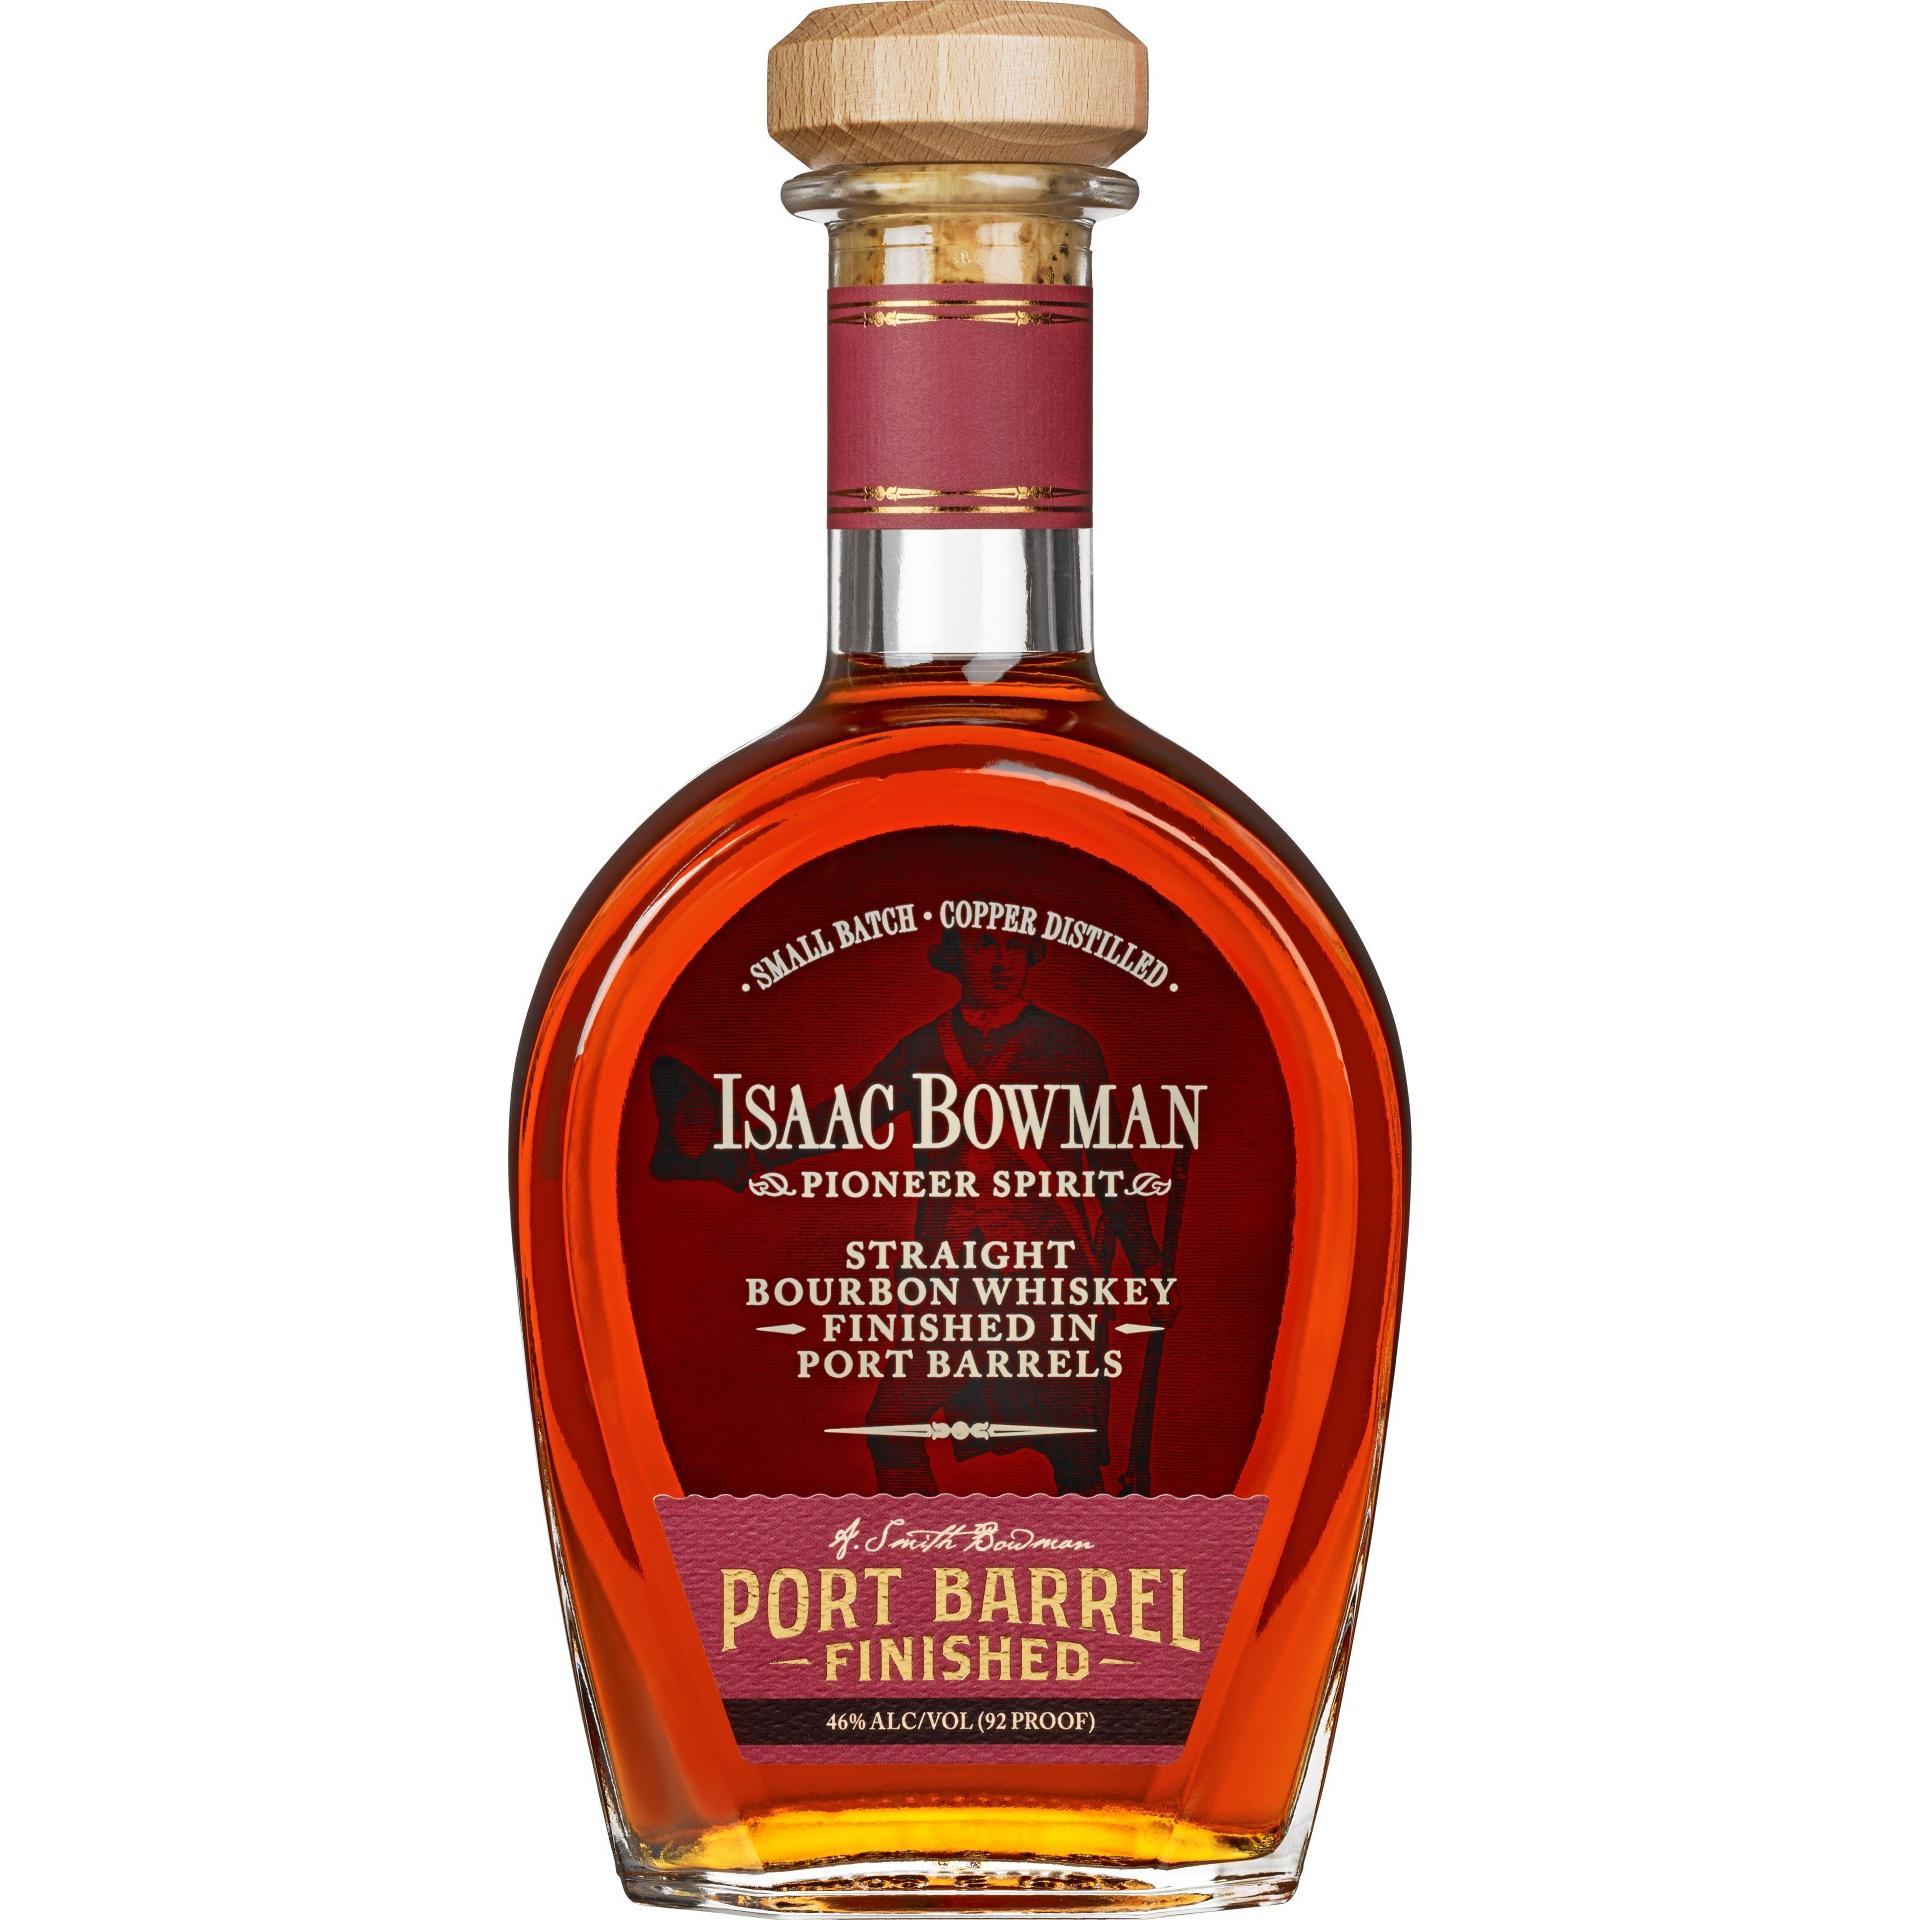 Isaac Bowman Port Barrel Bourbon Whiskey